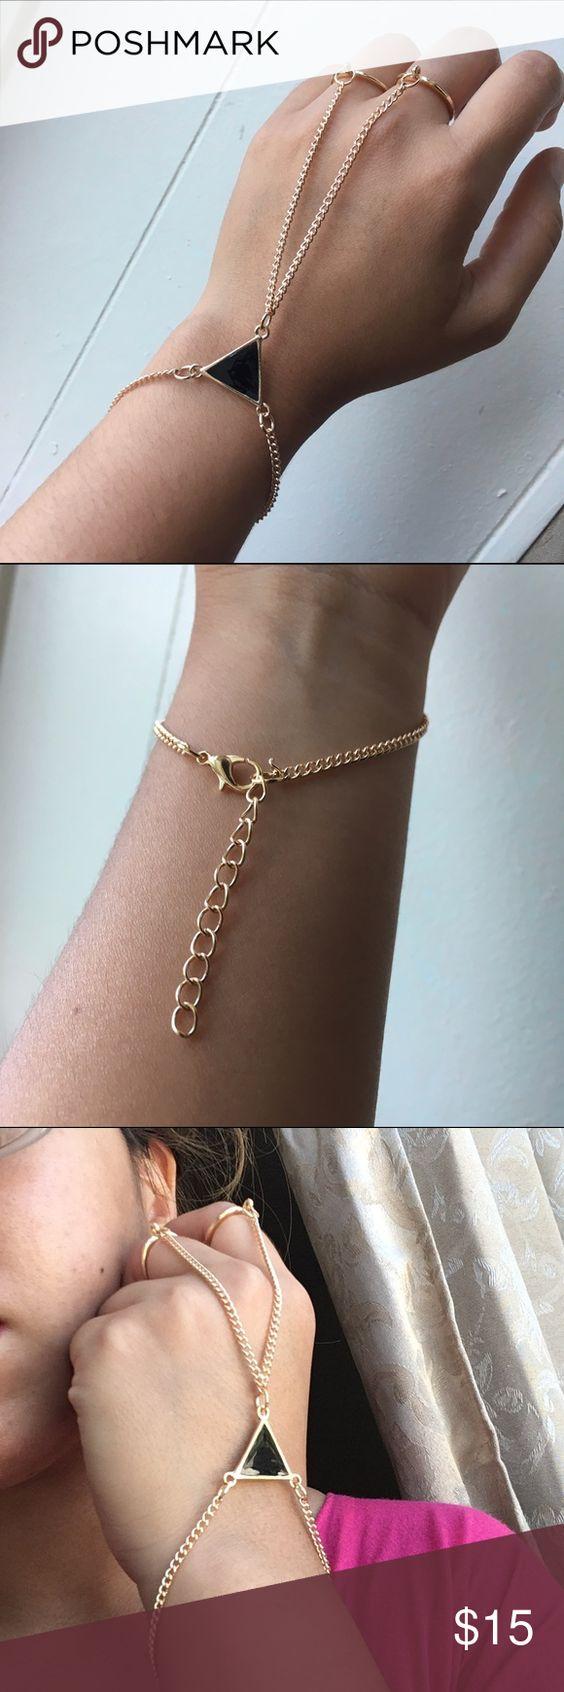 🦄Bracelet ring No brand. Never used. Still in packaging. Asos Jewelry Bracelets